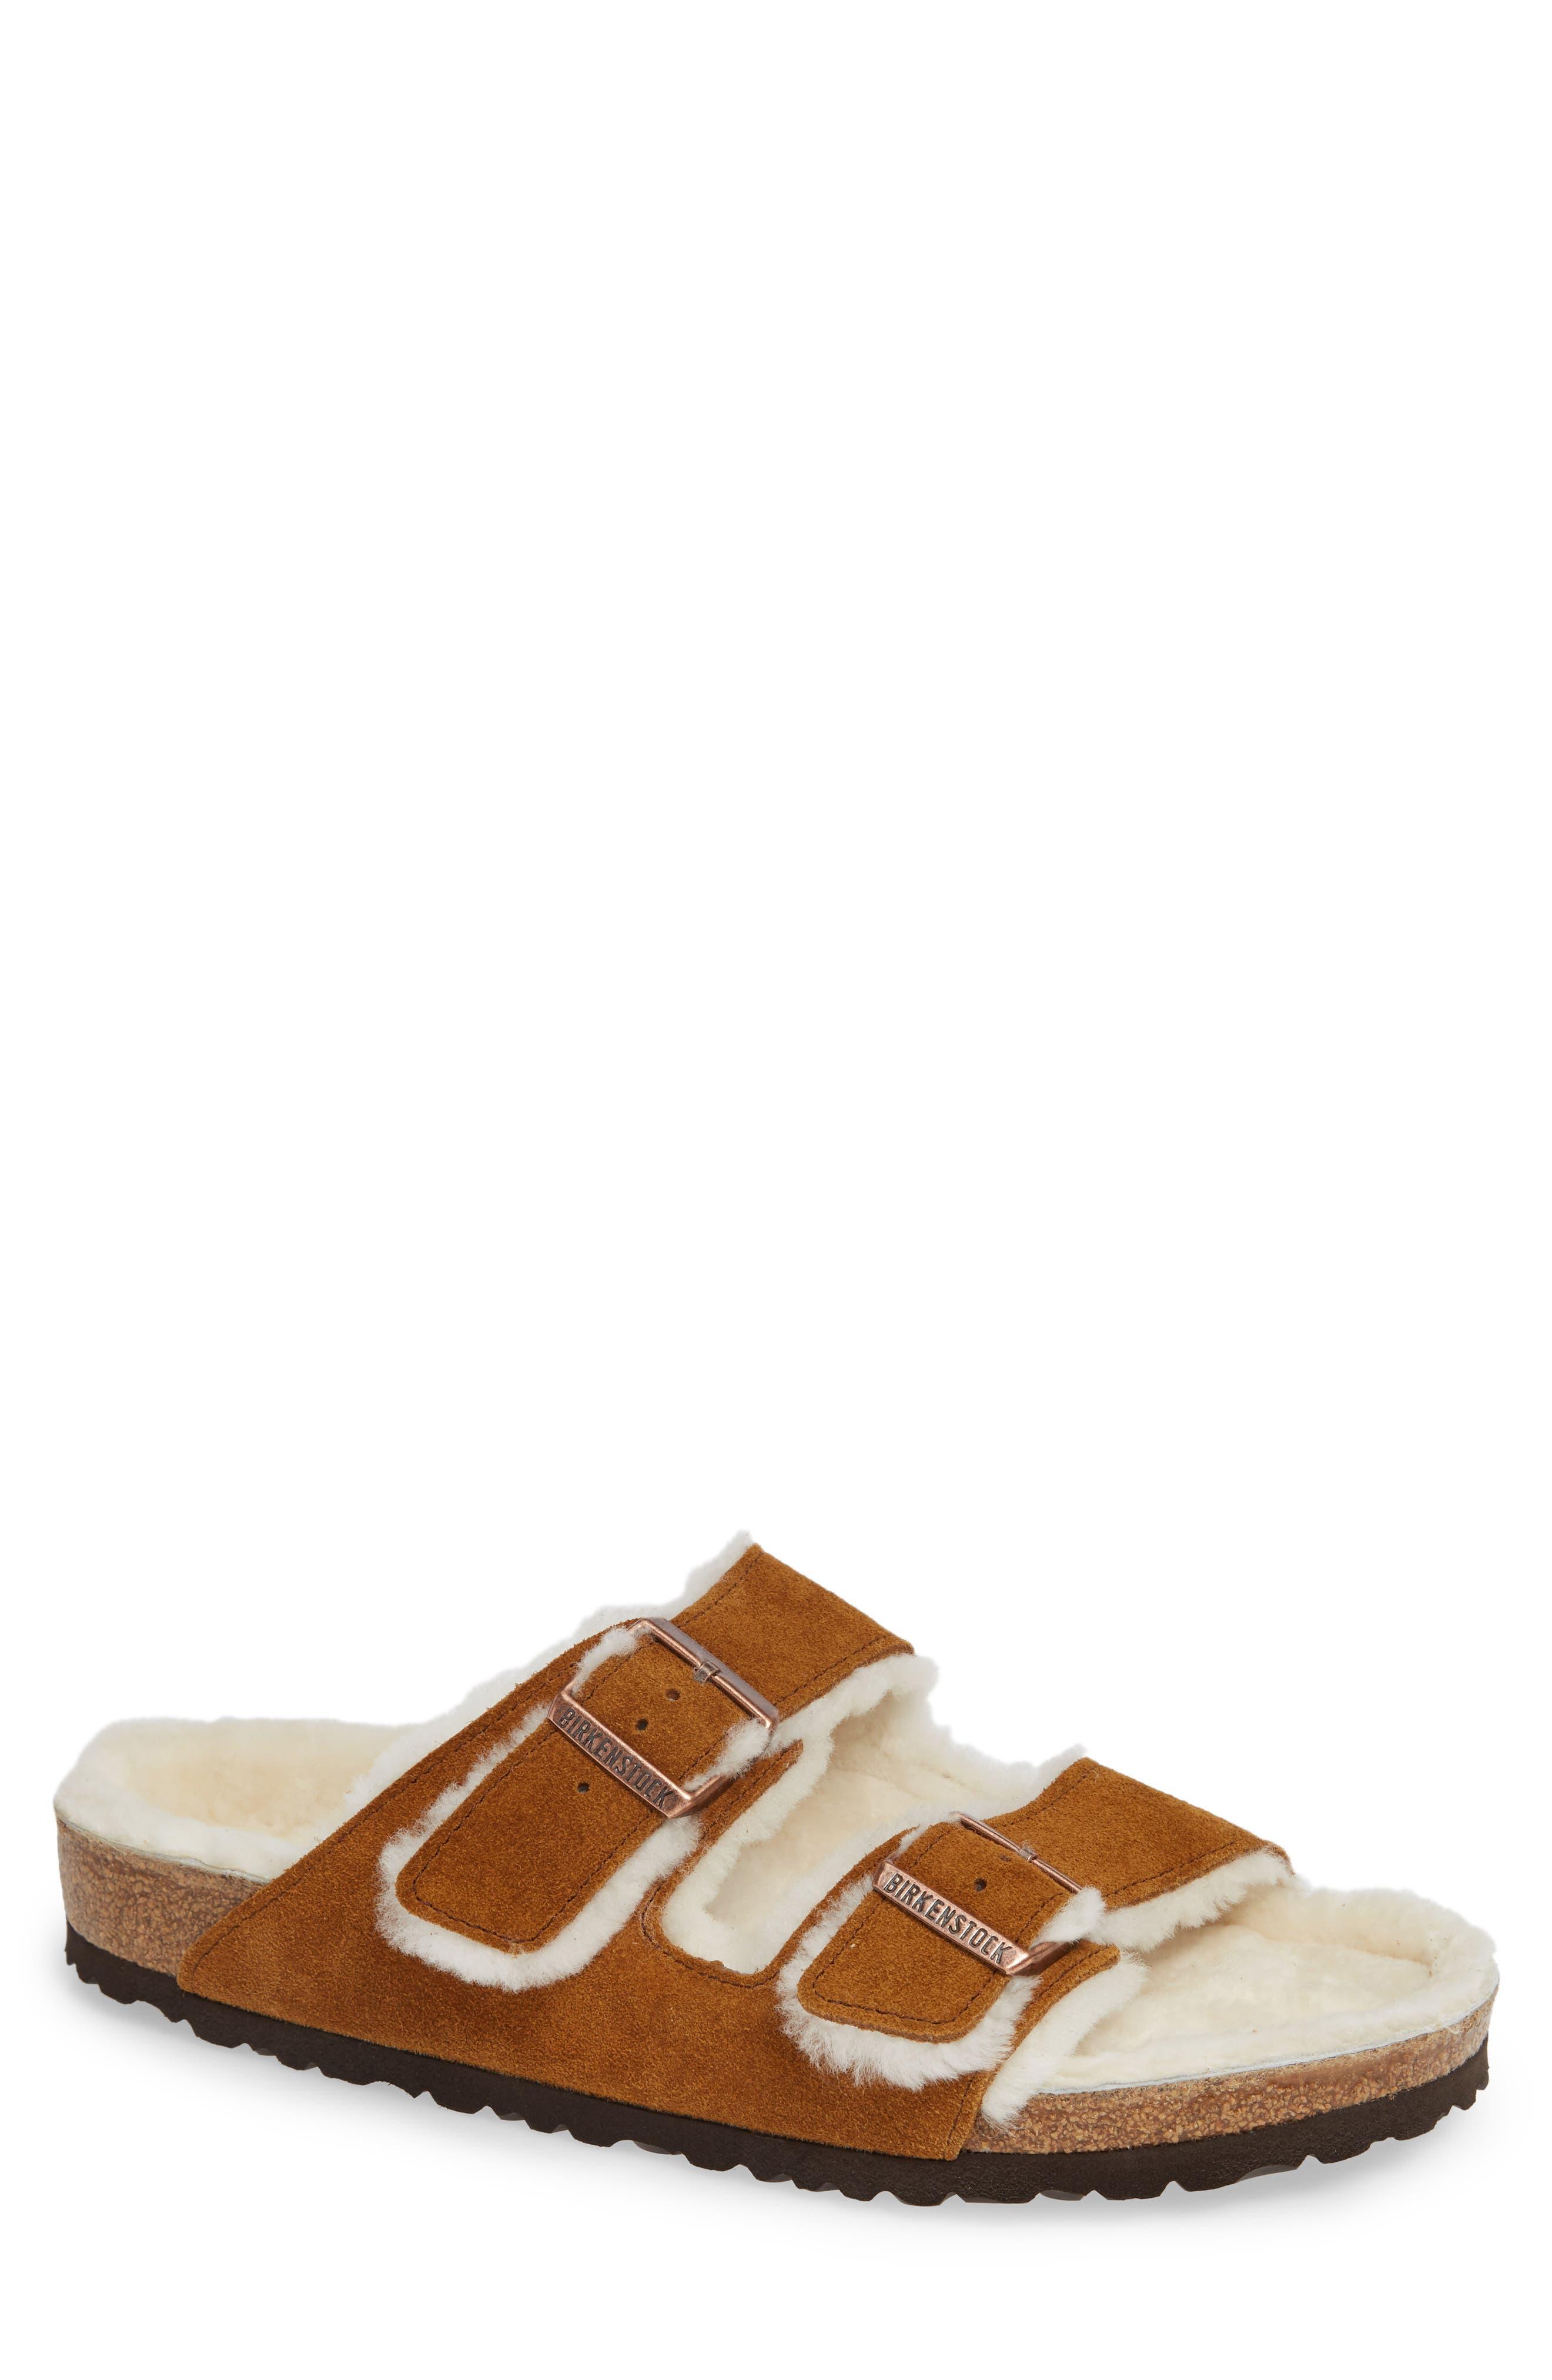 Arizona Slide Sandal with Genuine Shearling,                         Main,                         color, BEIGE